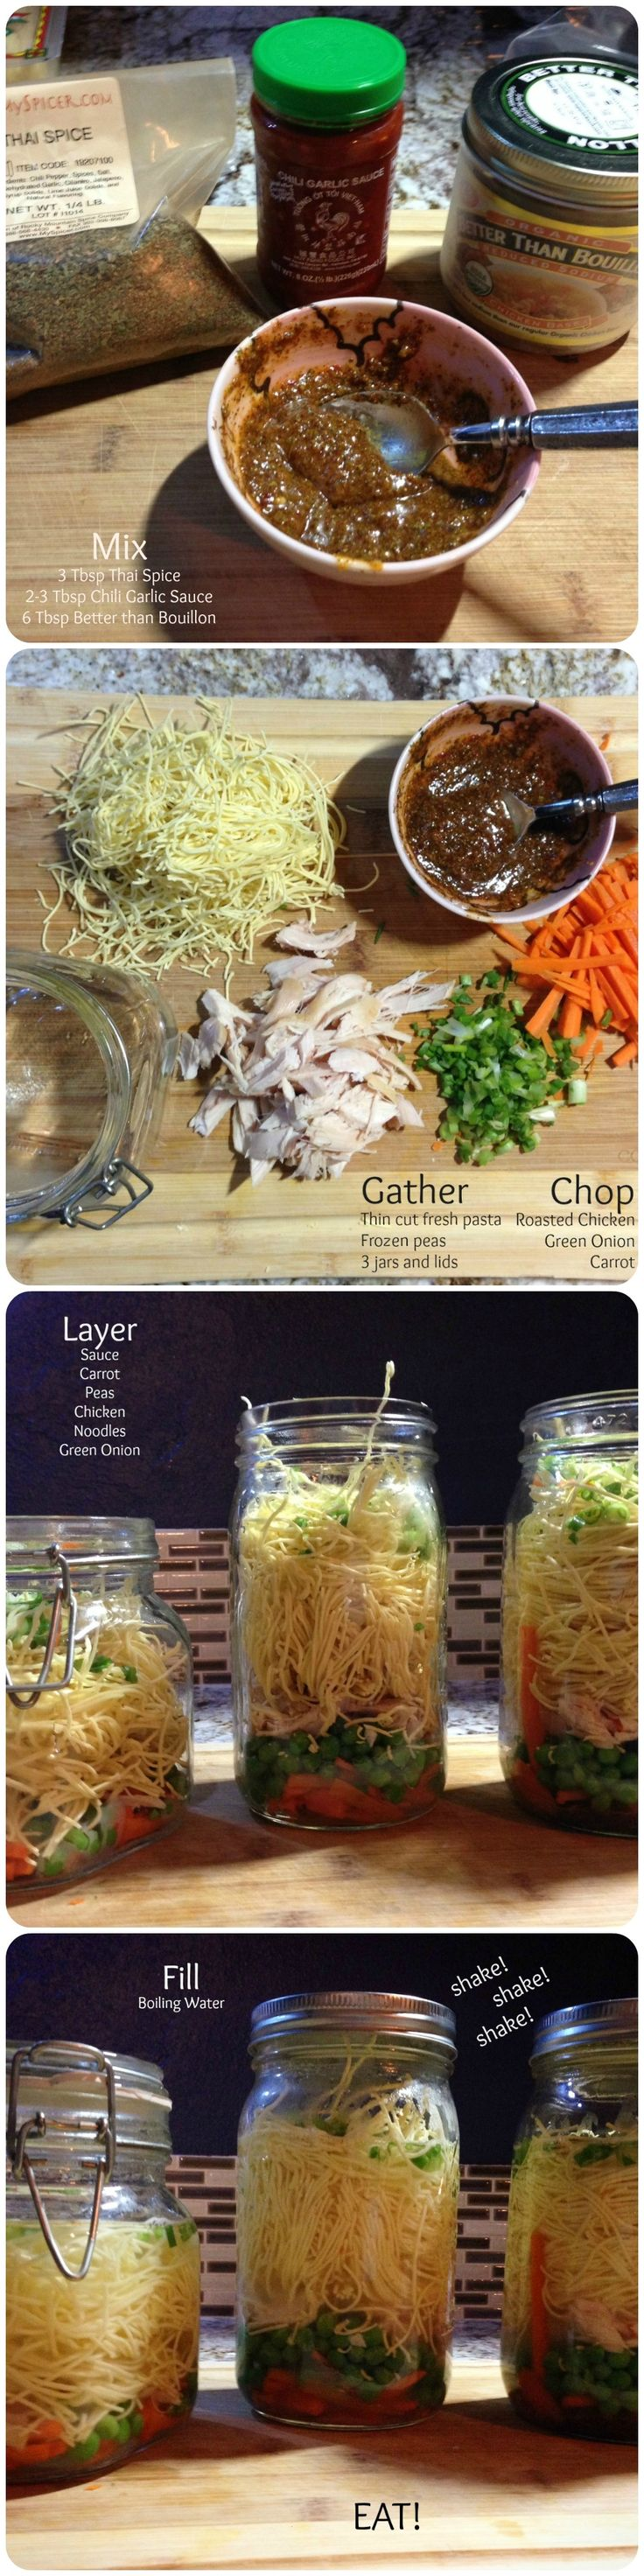 cup of soup, homemade ramen, soup in a jar, great lunch idea, easy dinner, DIY ramen, DIY cup of noodles, www.thesalvagebureau.com